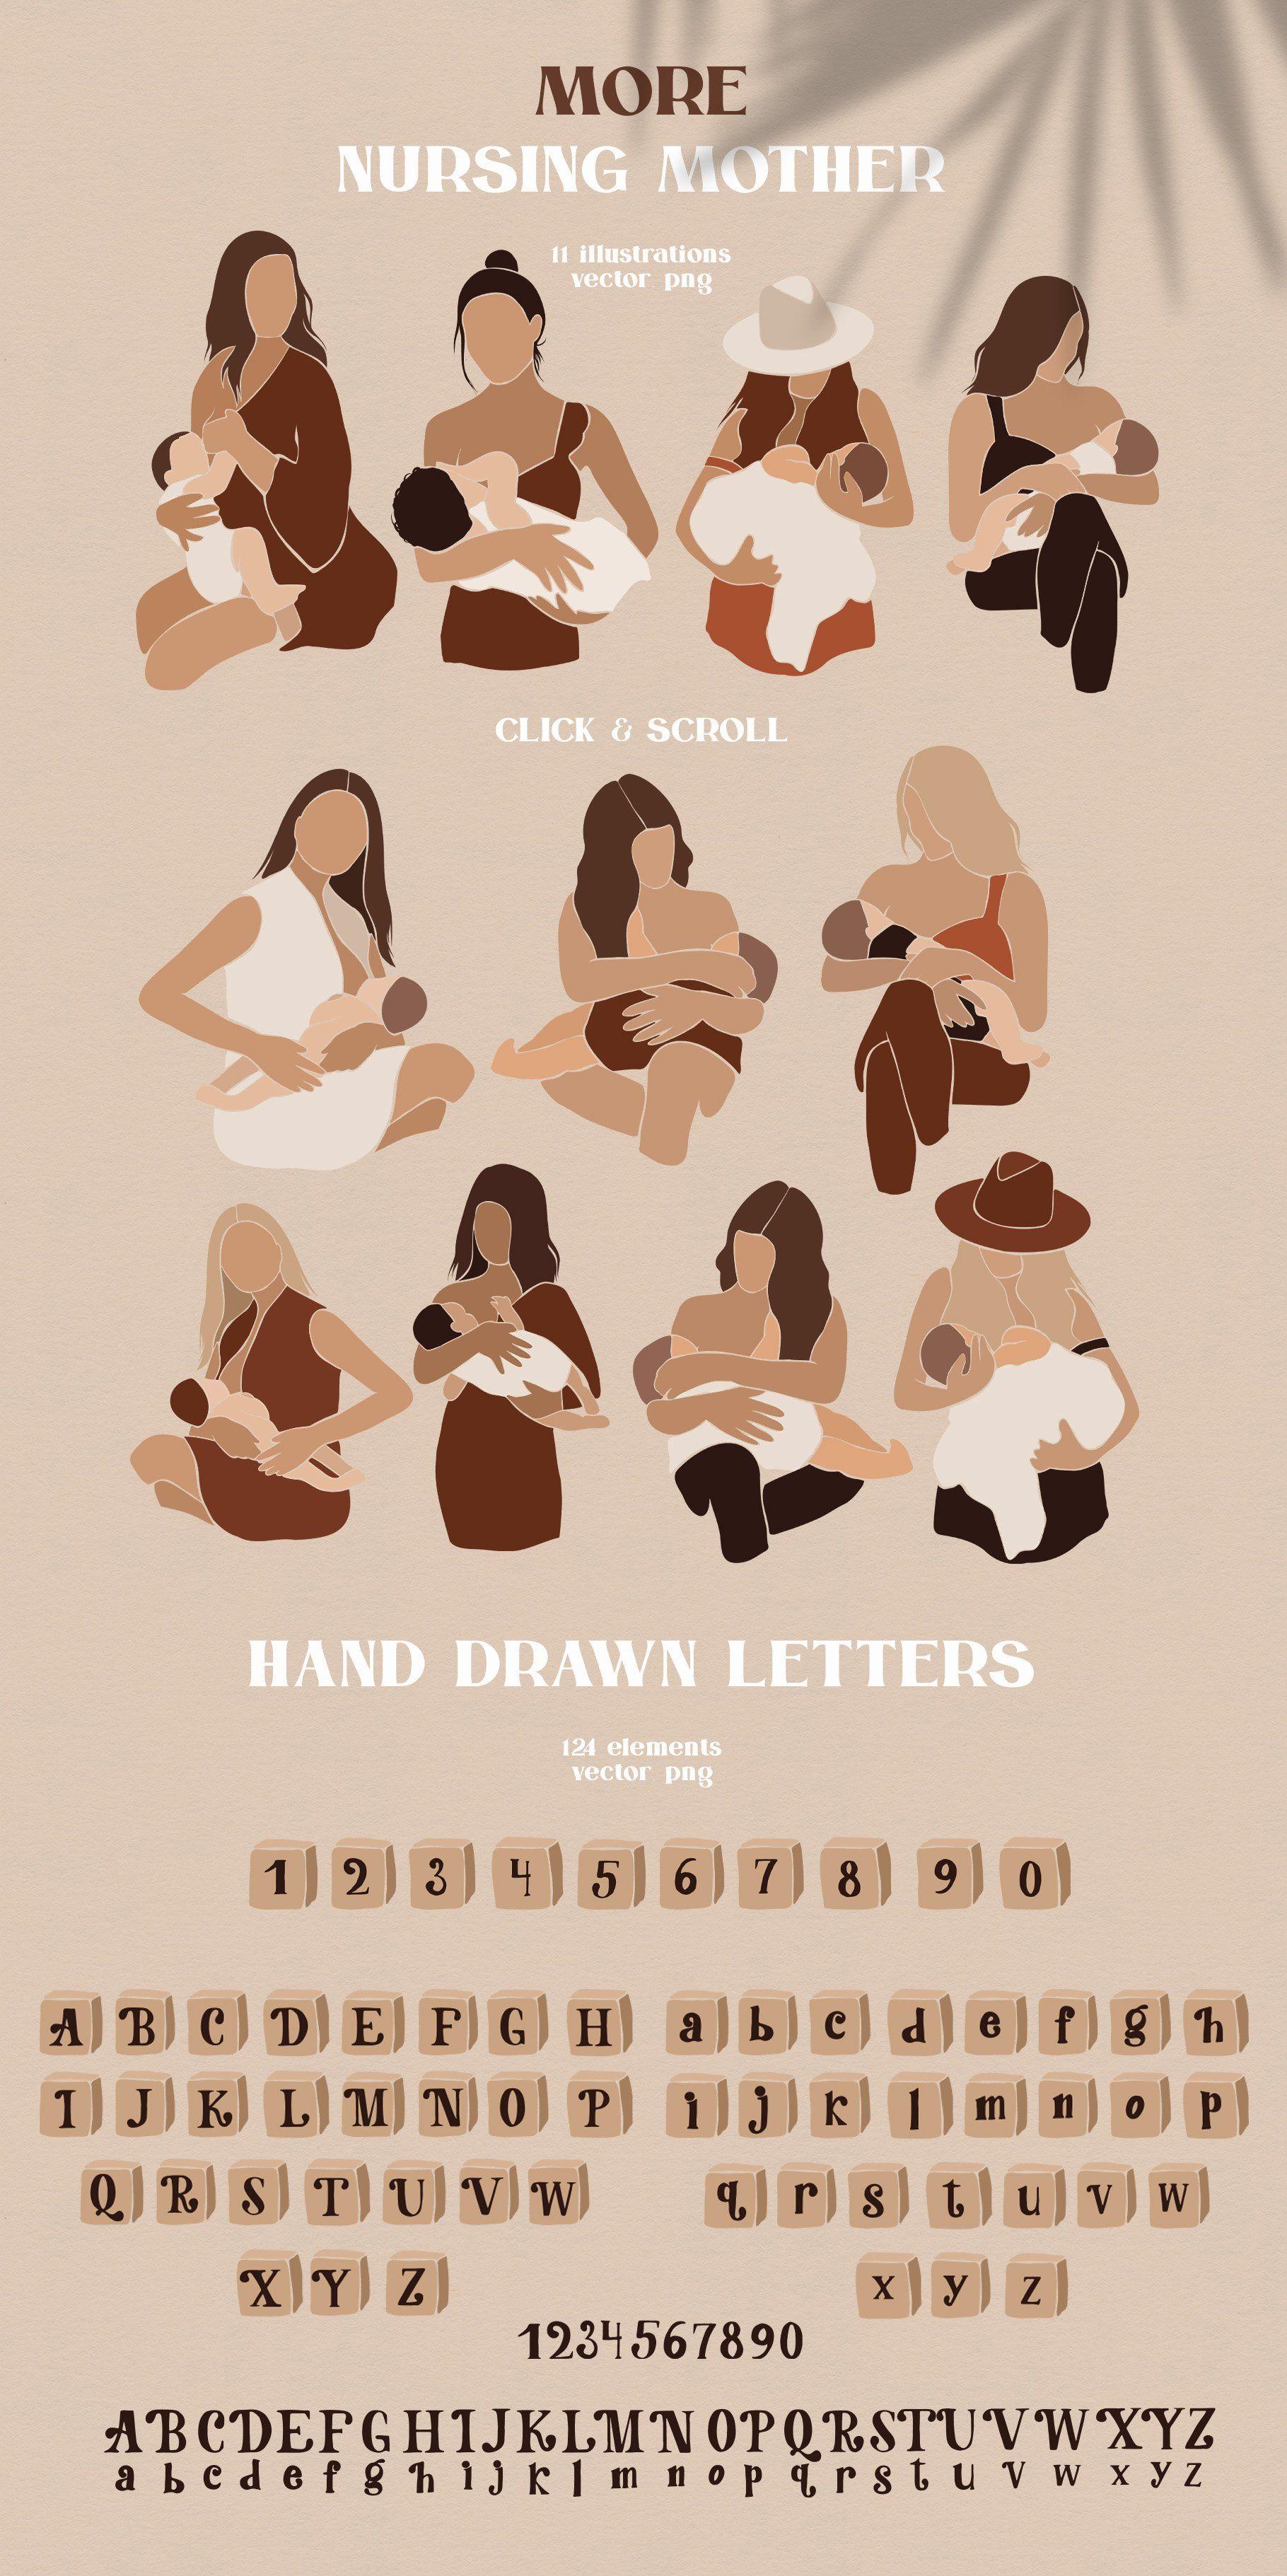 Abstract Kids Bundle In 2020 Children Illustration Illustration Graphic Illustration